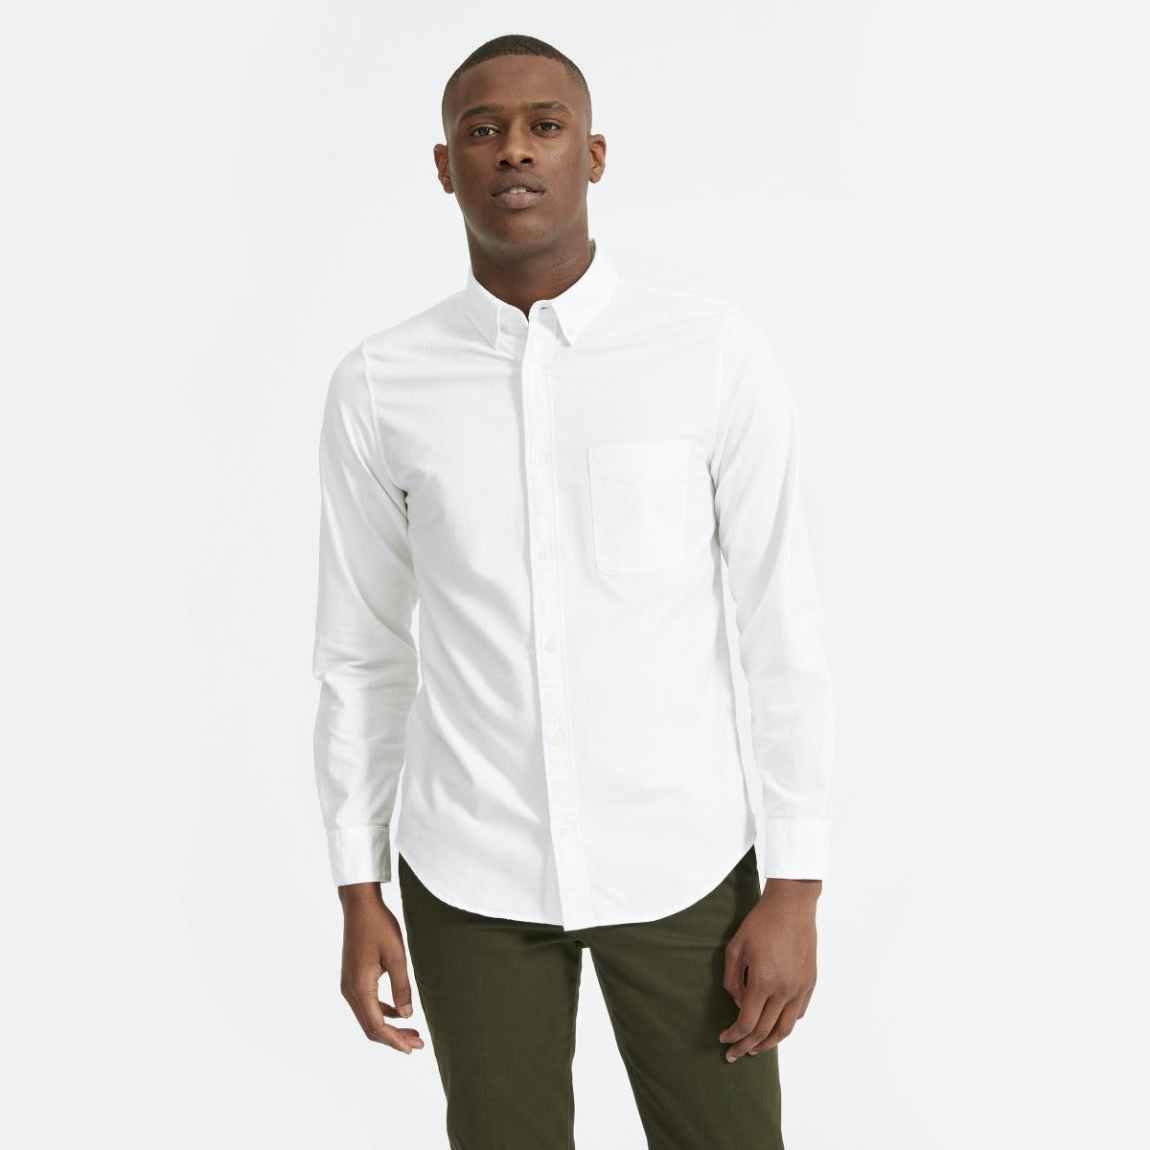 everlane shirt, everlane, white oxford shirt, white button up shirt, japanese oxford, slim fit oxford, white shirt, denimblog, denim blog